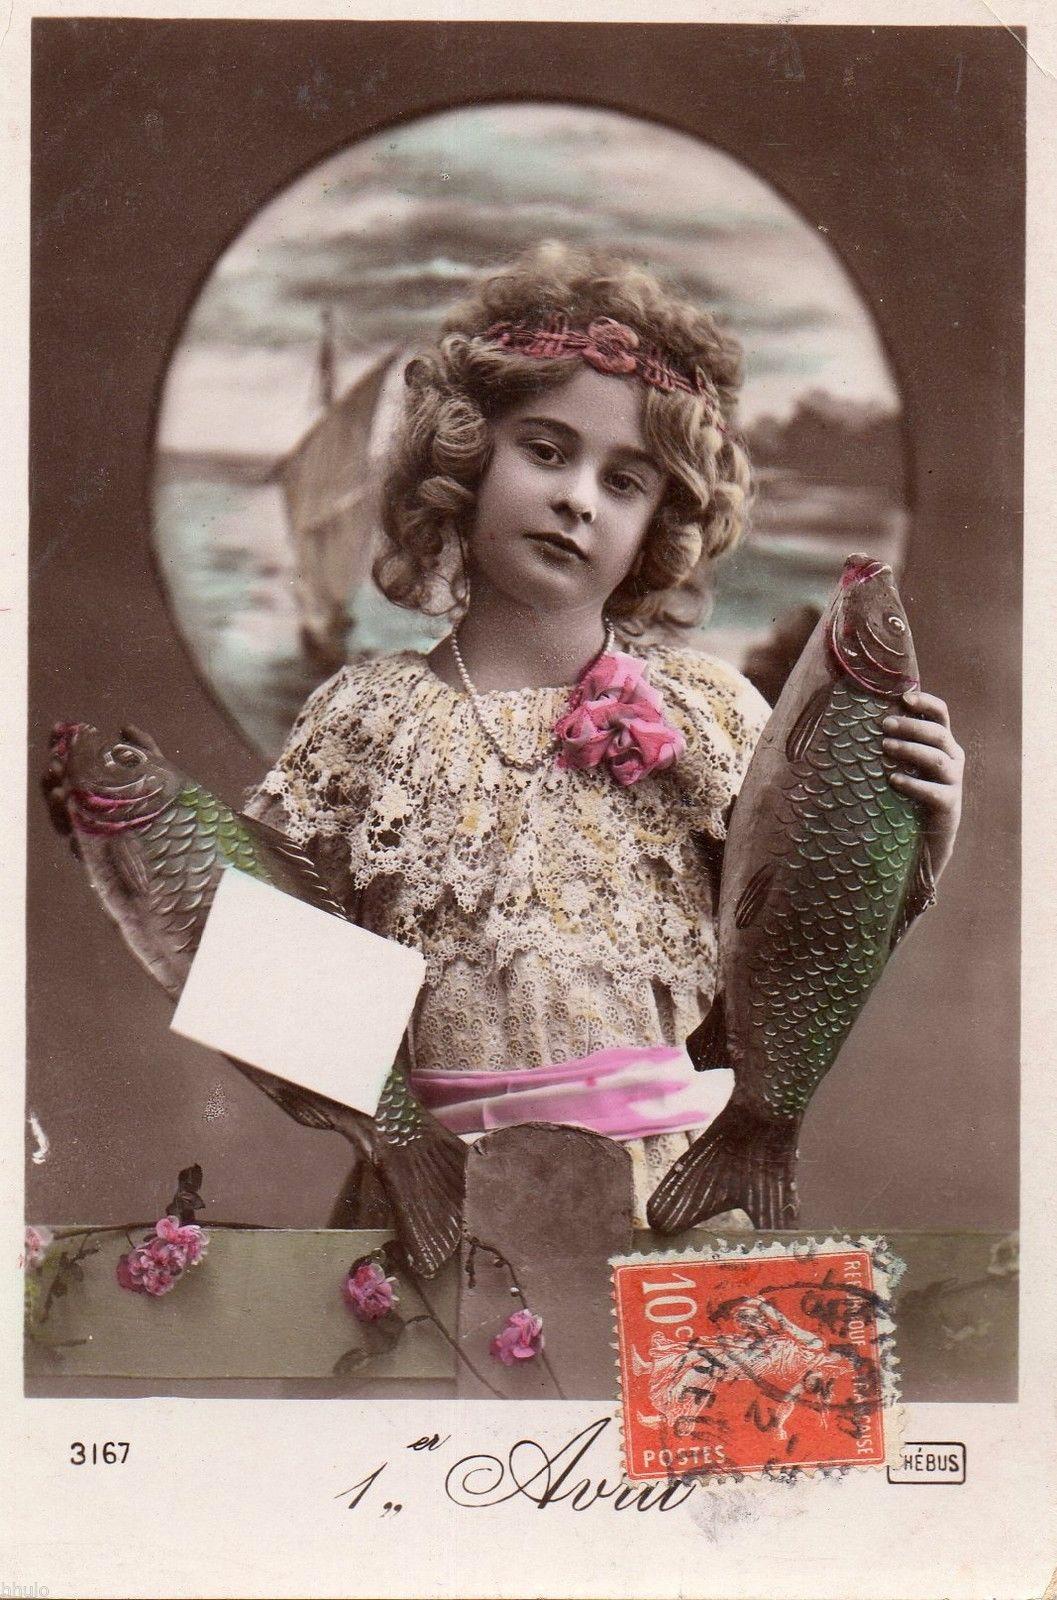 poisson d' avril post cards 7